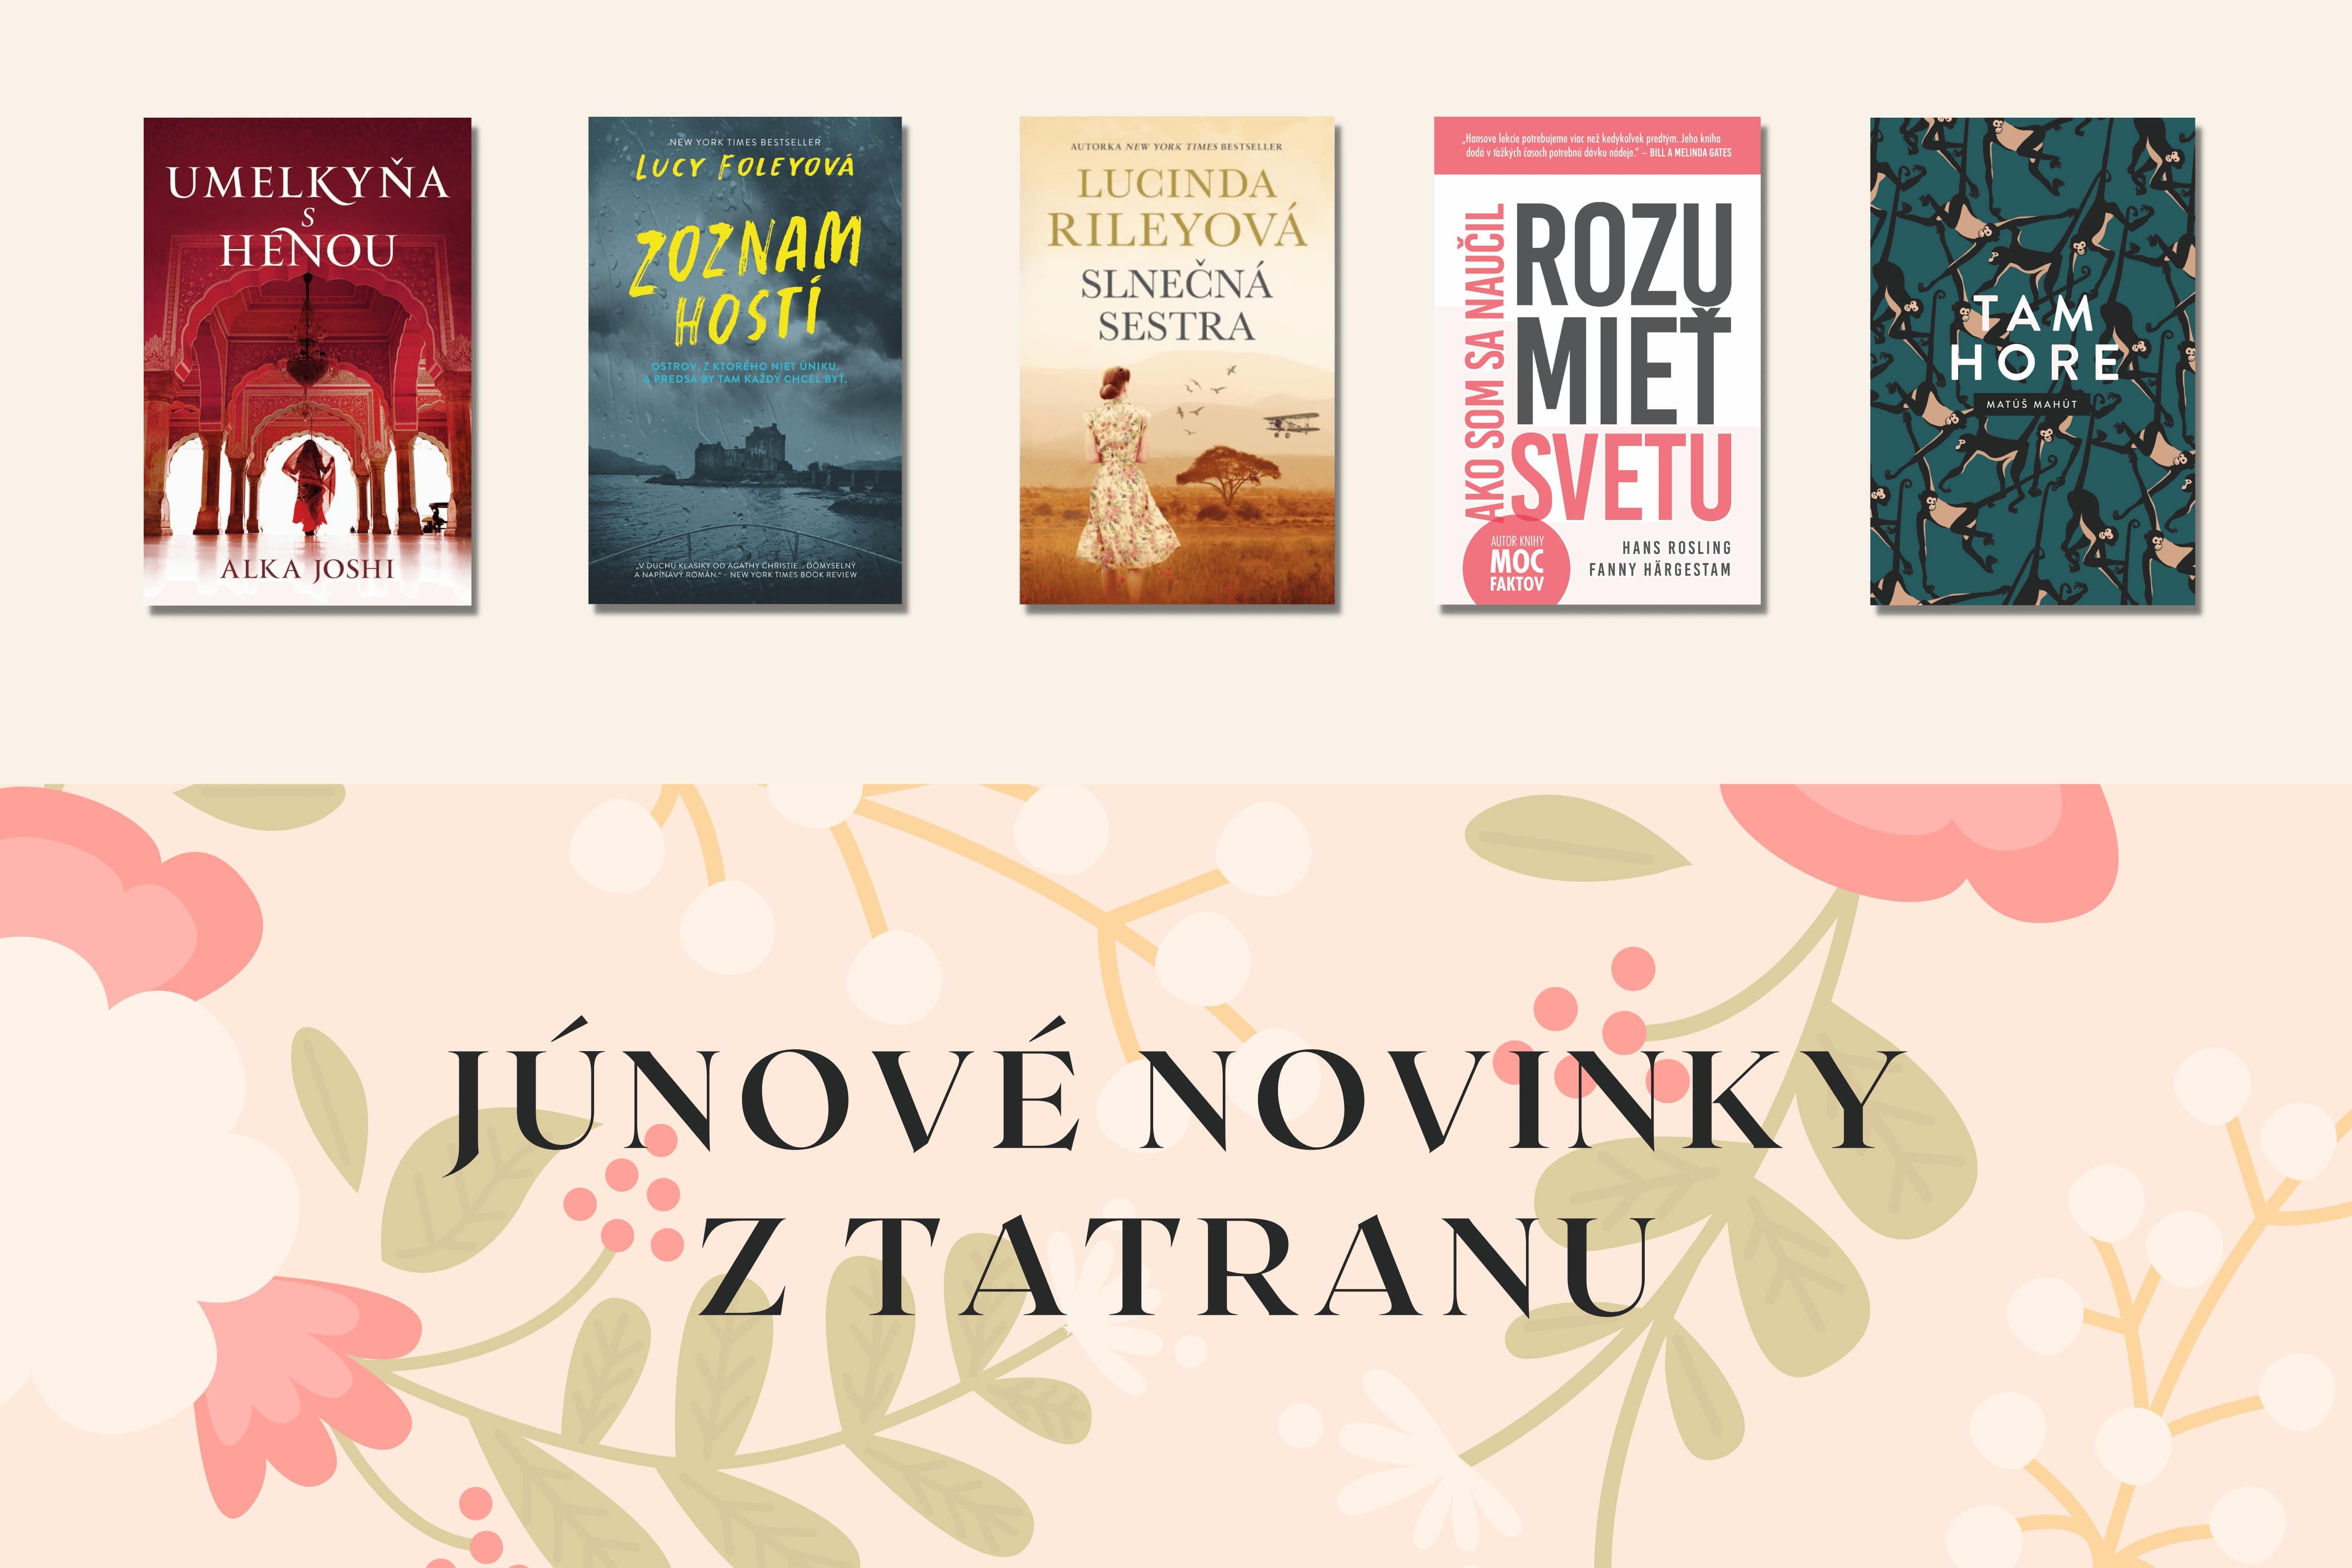 Júnové novinky z Tatranu